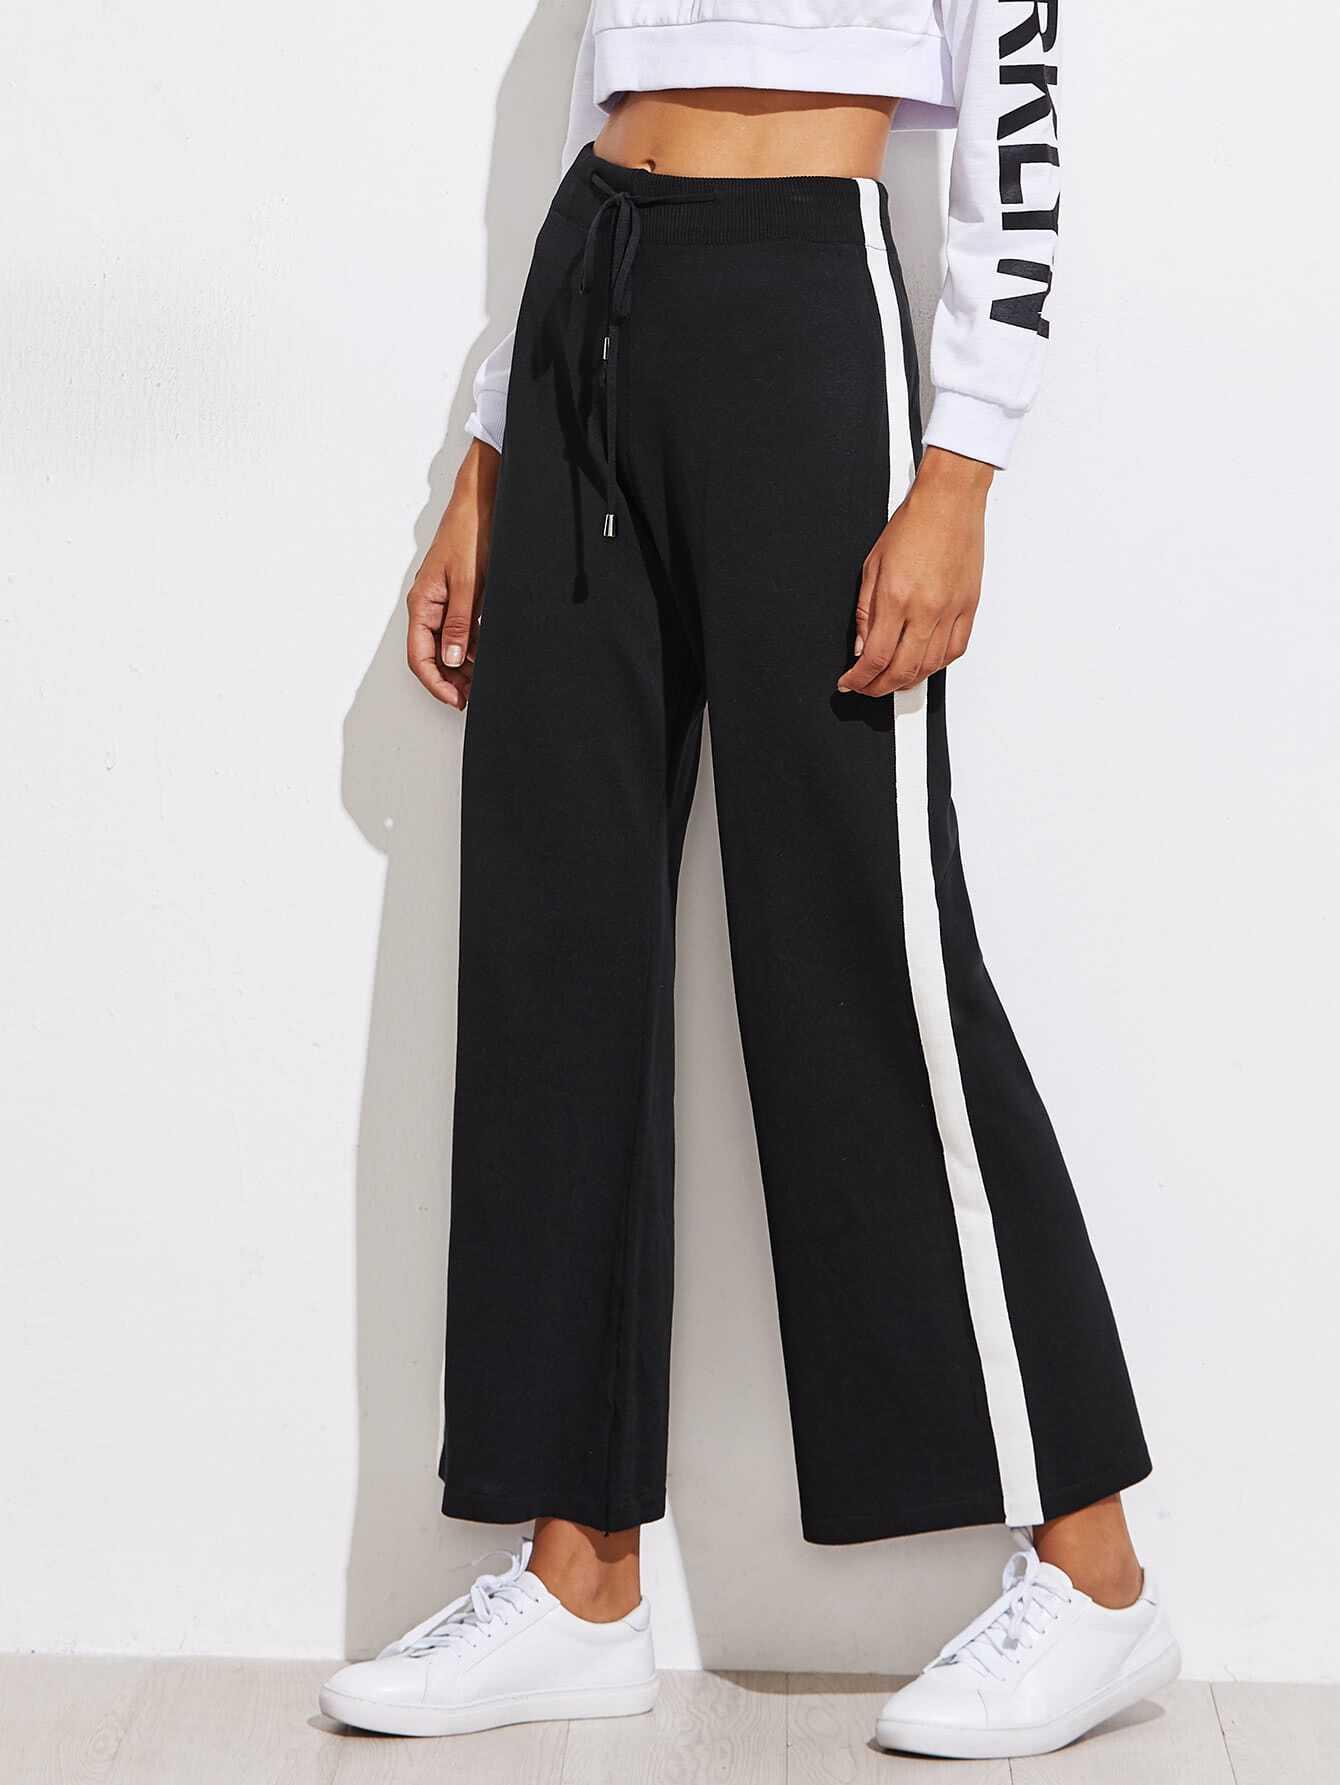 Contrast Panel Side Track Pants striped side track pants